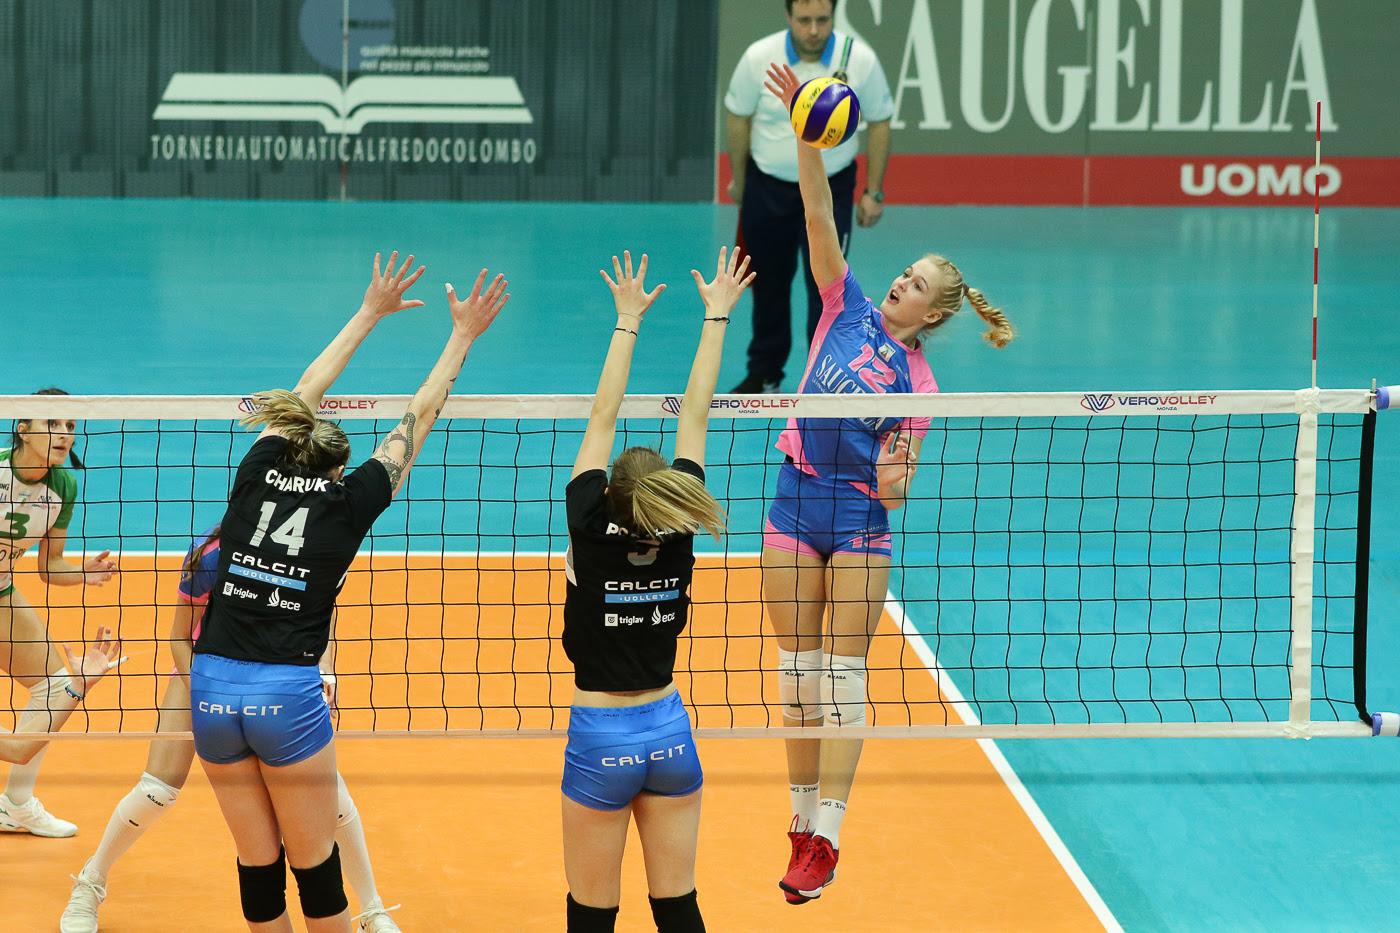 Vero Volley pallavolo Hanna Orthmann